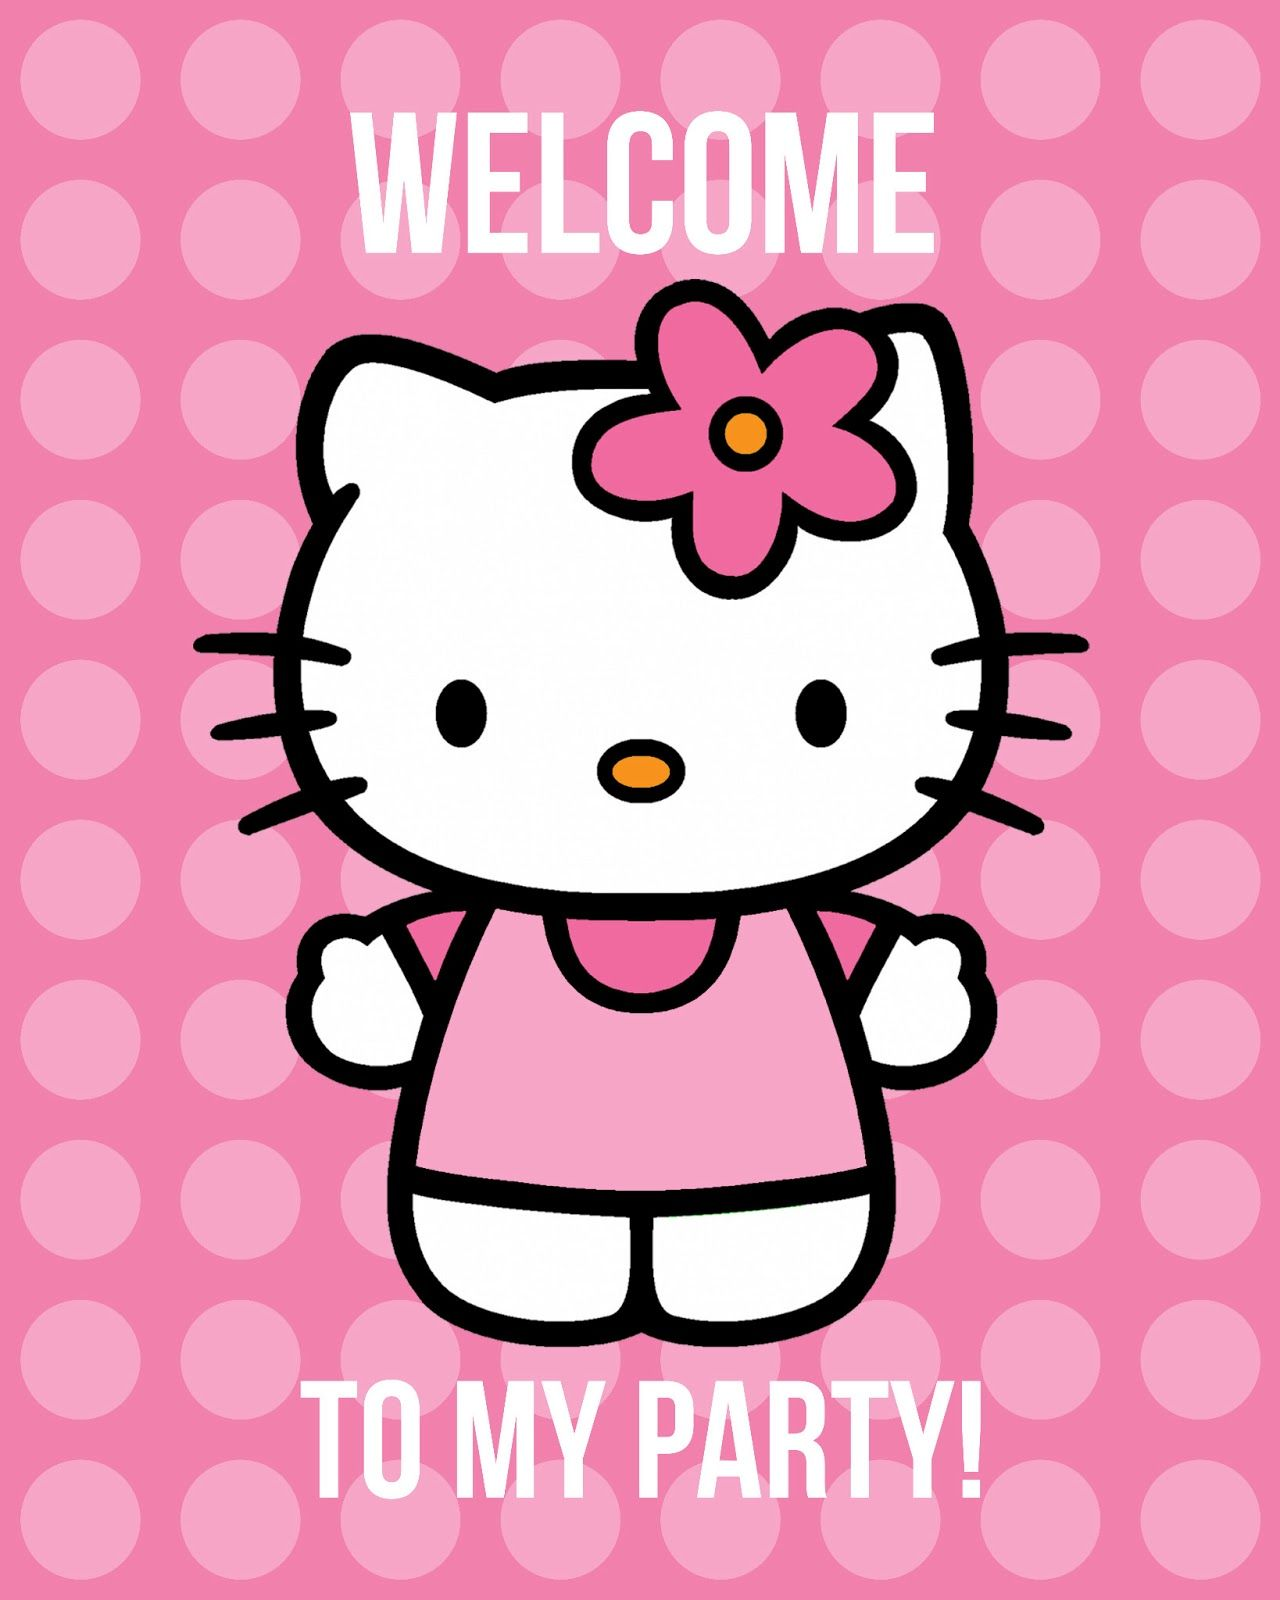 all things simple free Hello Kitty printablesinvites